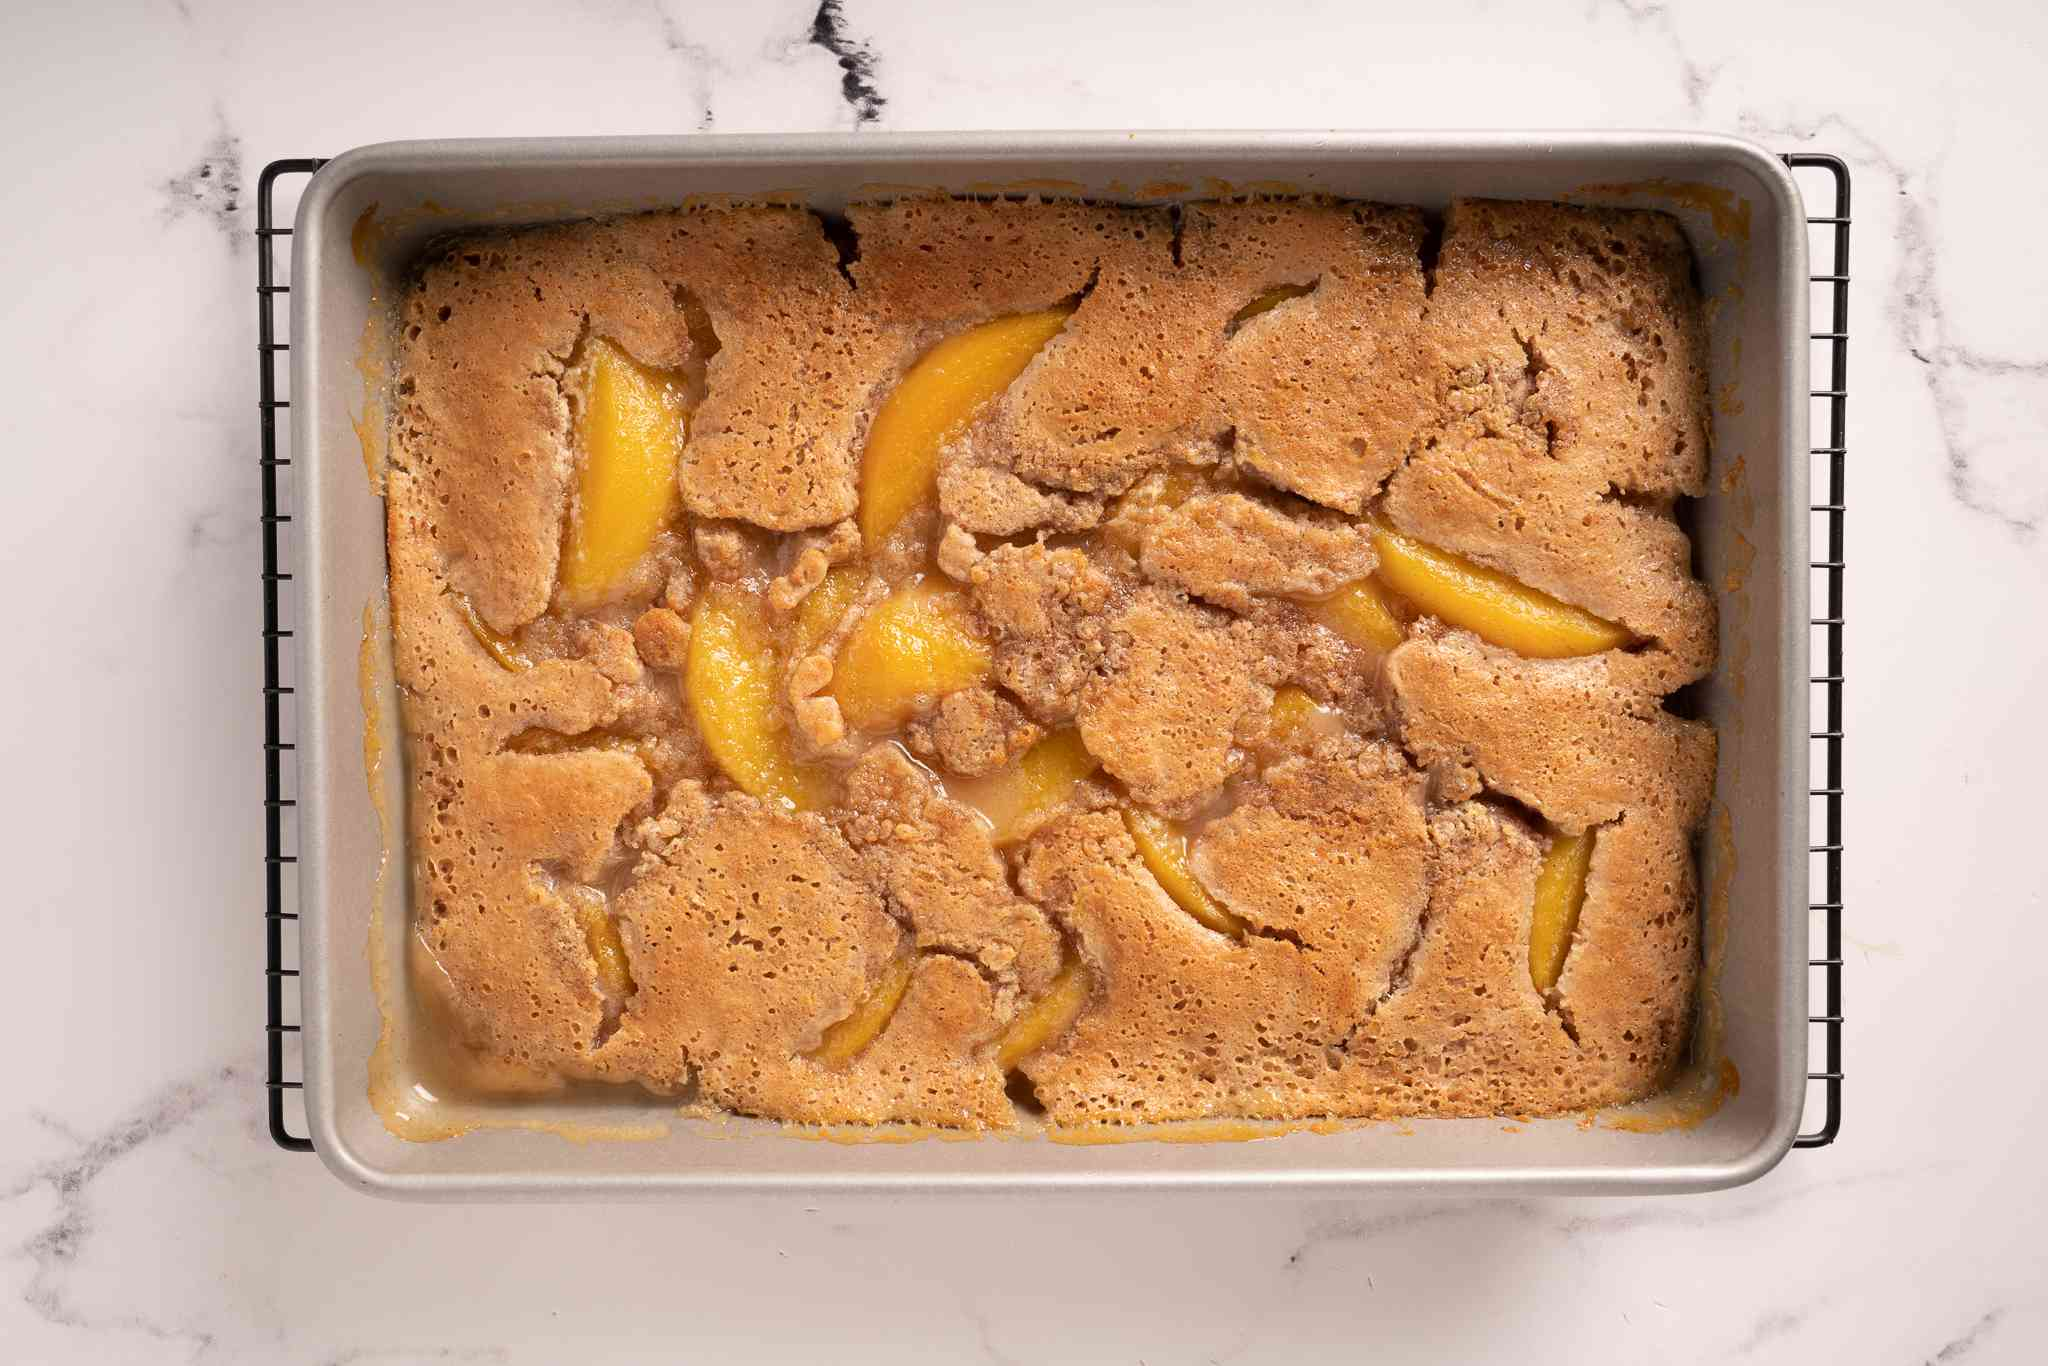 Everyone's Favorite Shortcut Peach Cobbler in a baking dish